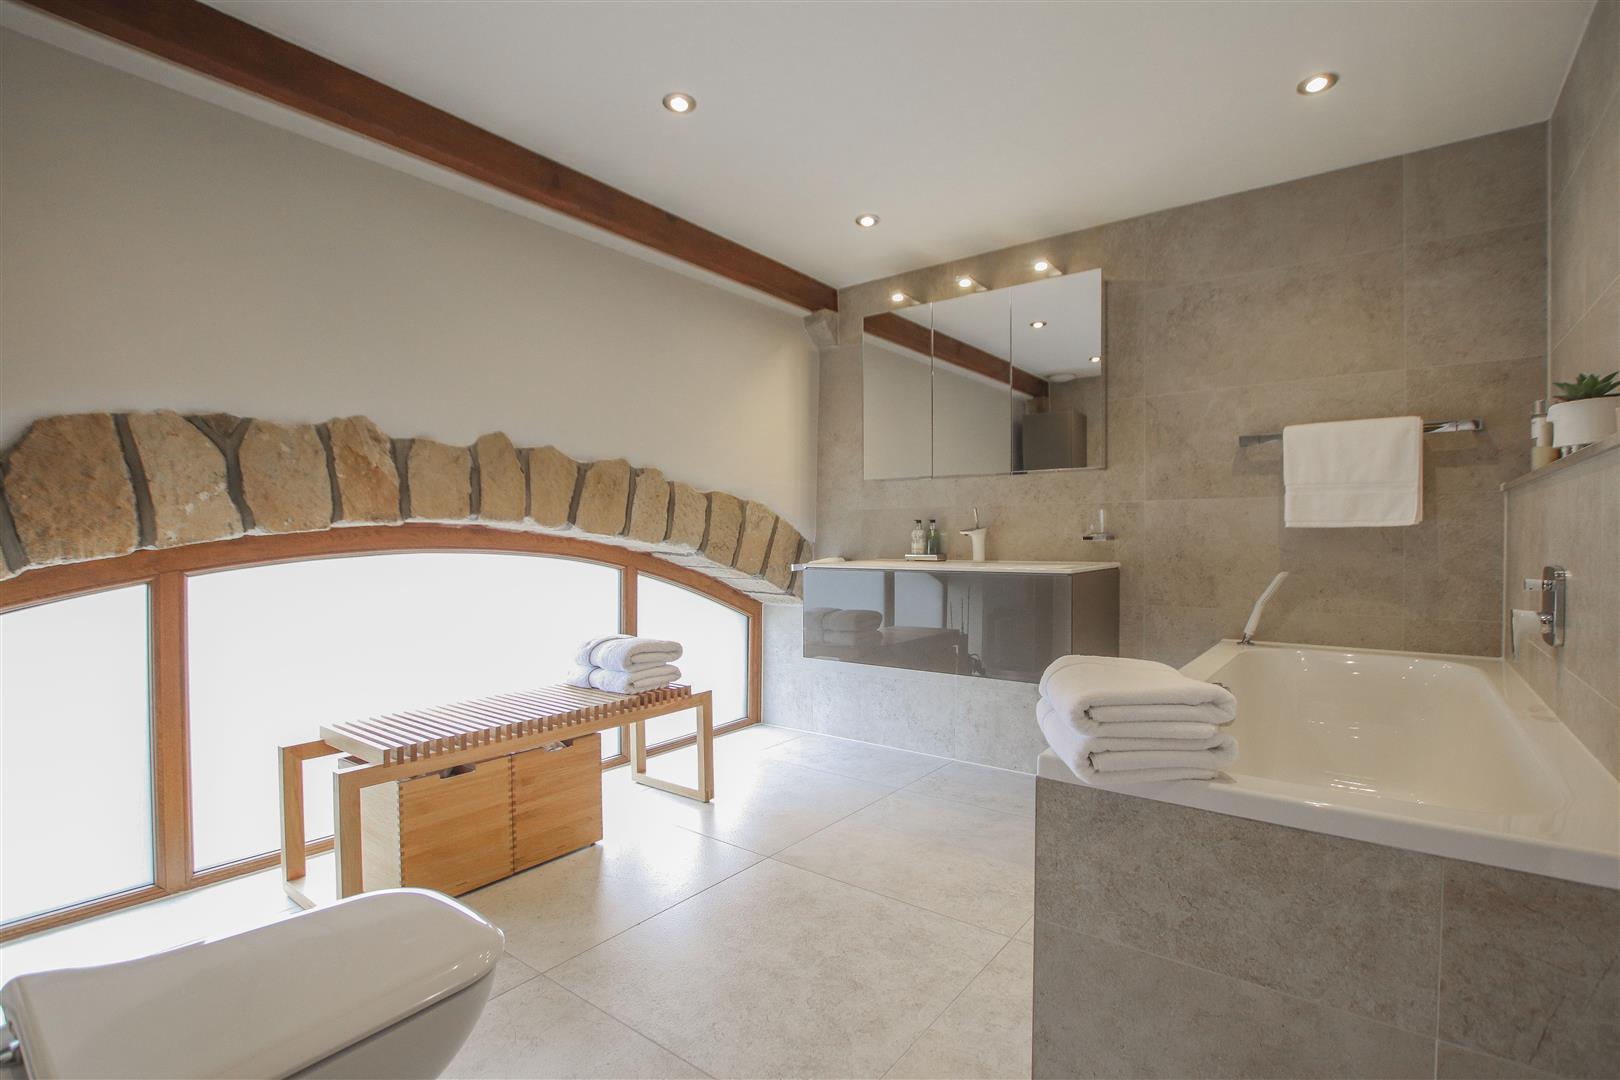 5 Bedroom Semi-detached House For Sale - 22.JPG